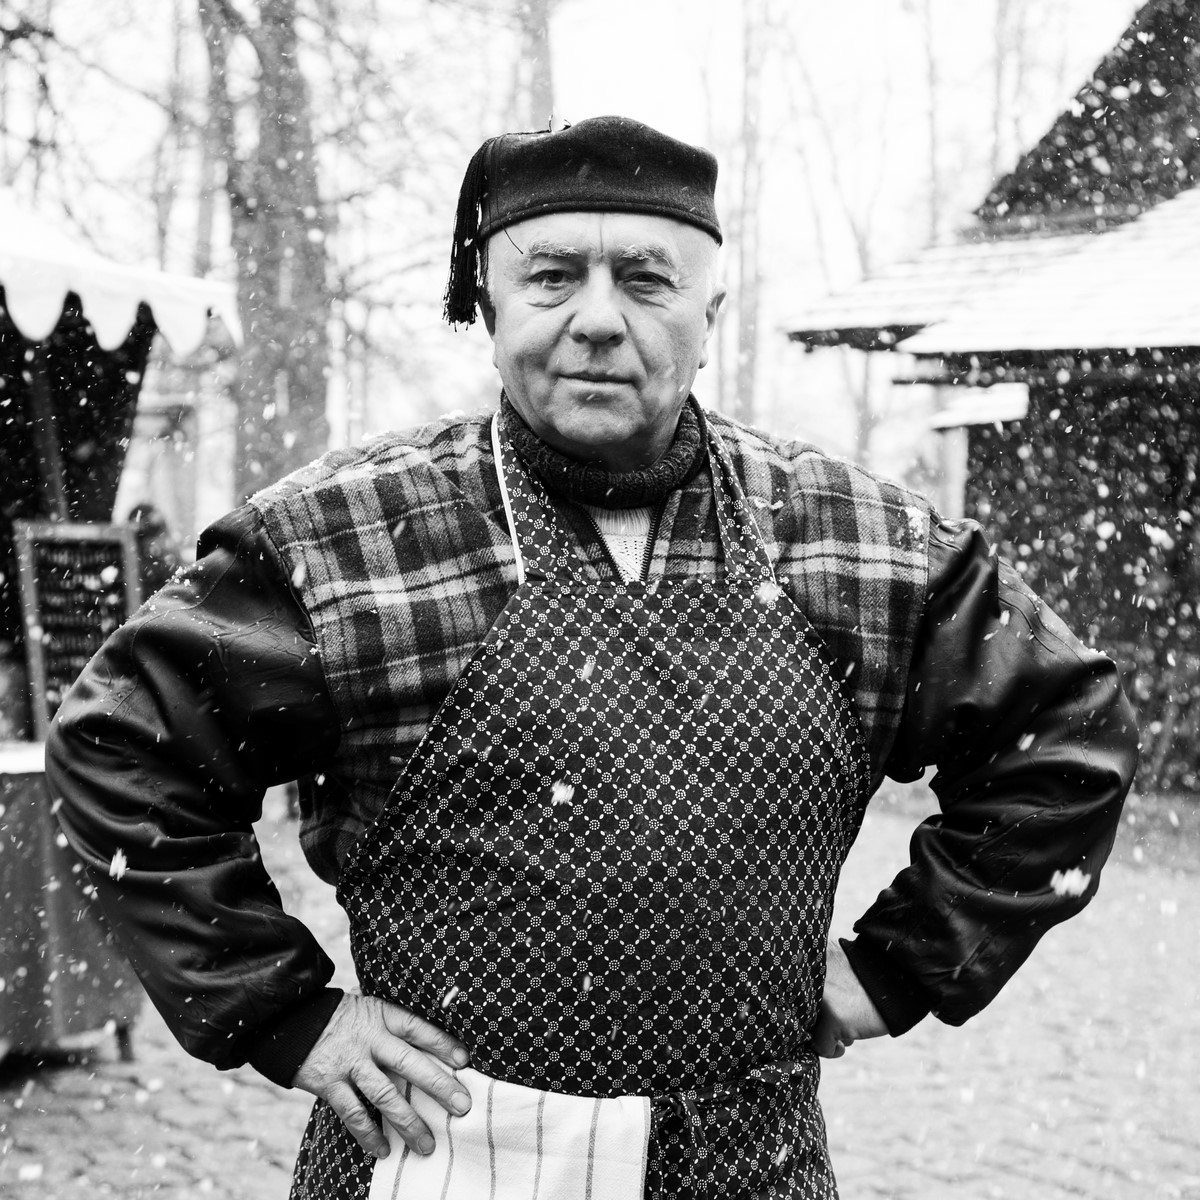 Jan Kočka Radosta